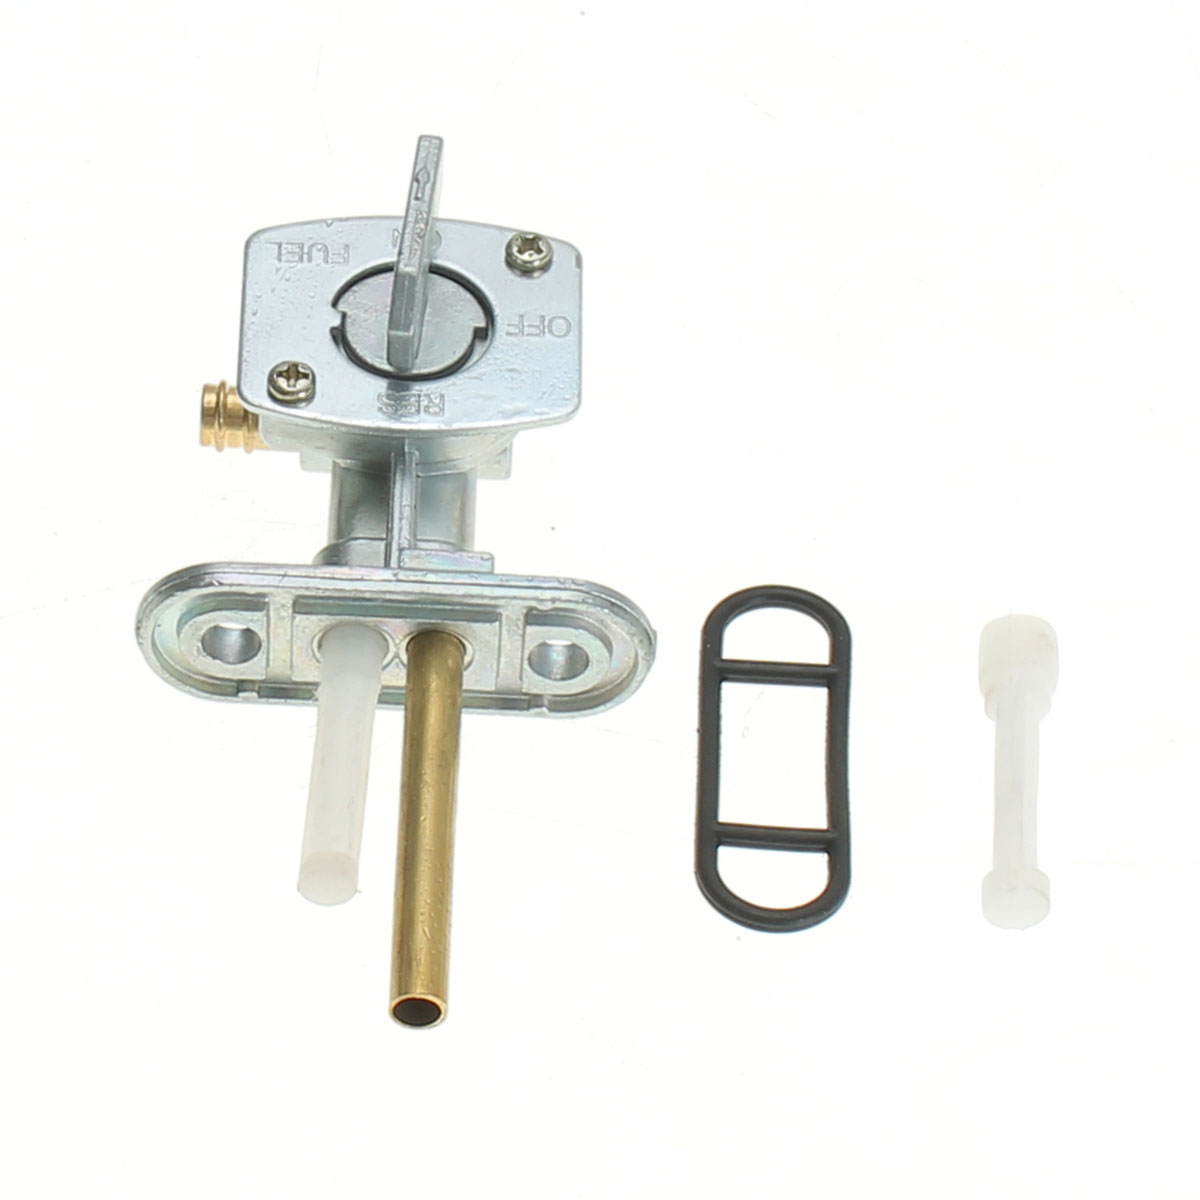 hight resolution of yamaha blaster wiring harness circuitdata mx tl 06 yamaha blaster 200 wiring diagram 06 circuit diagrams